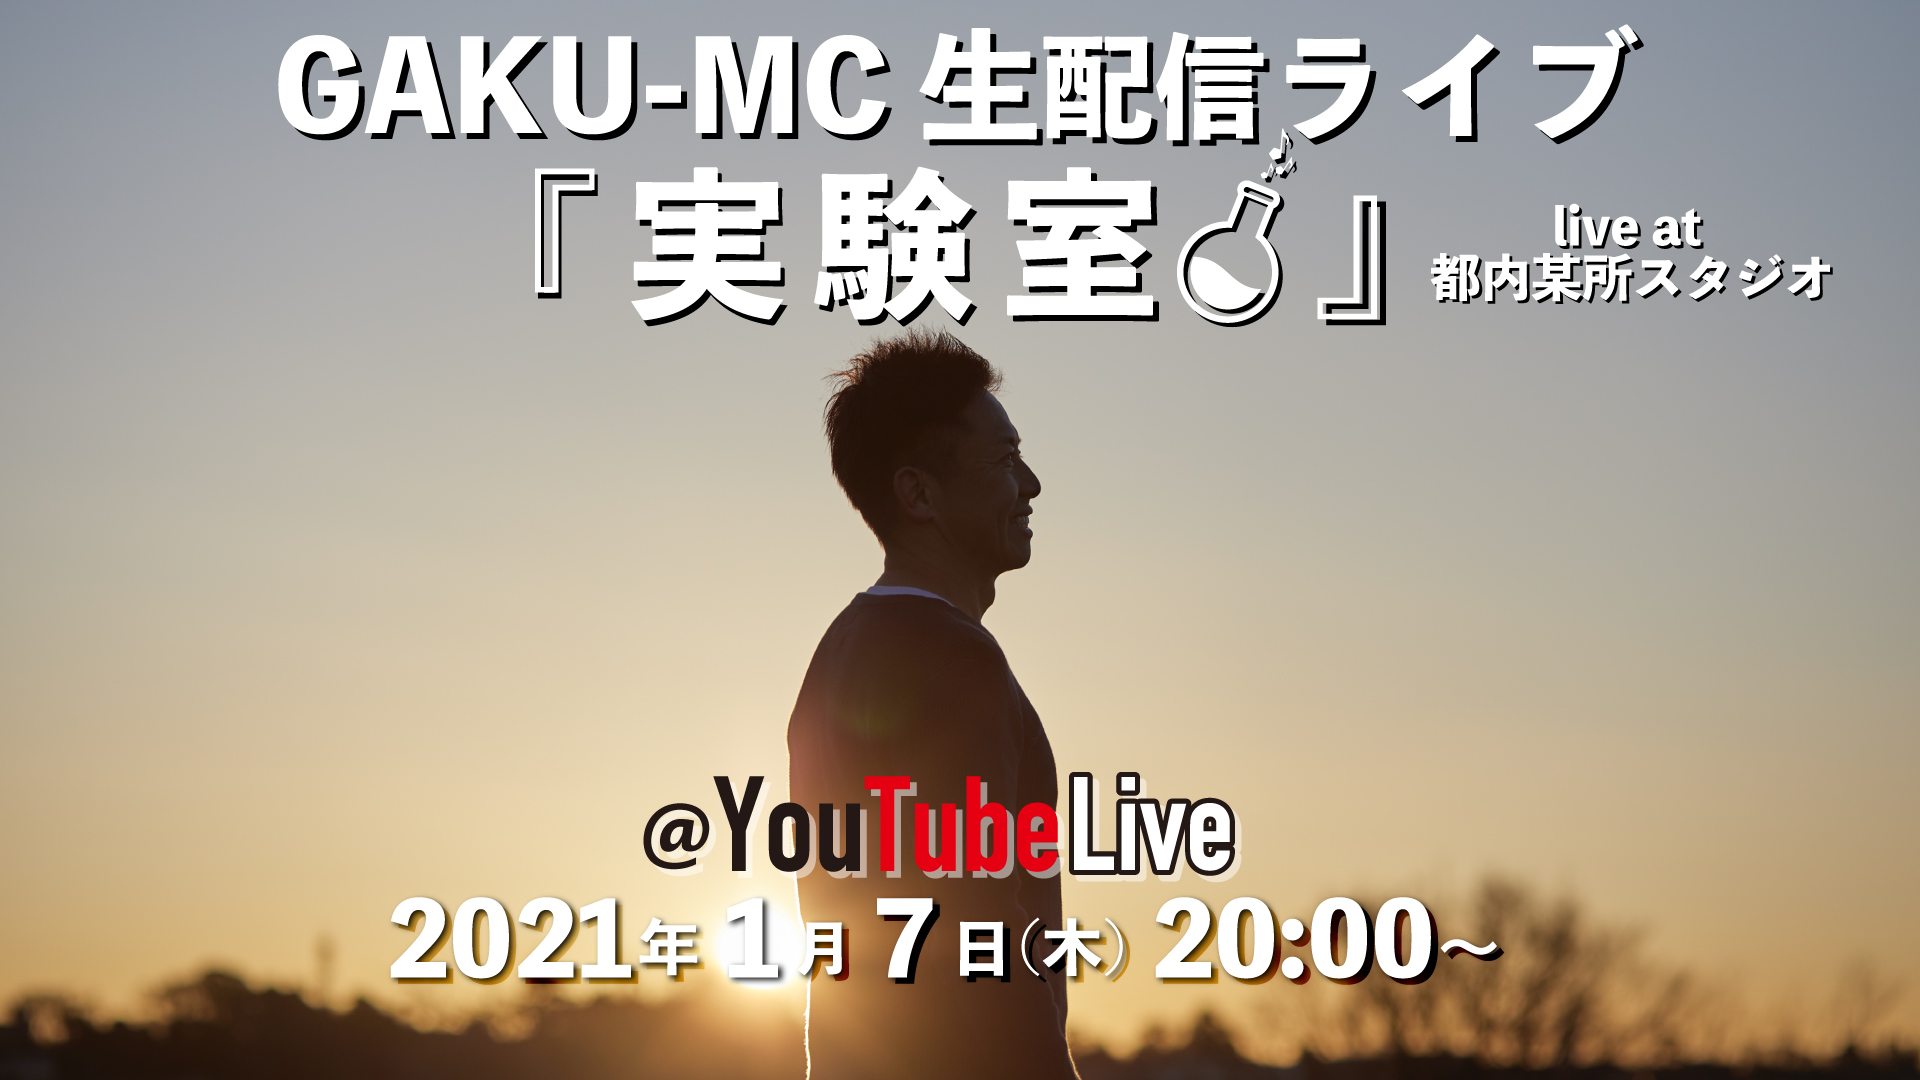 GAKU-MC  #Live始め 2021 『実験室』 live at 都内某所スタジオ